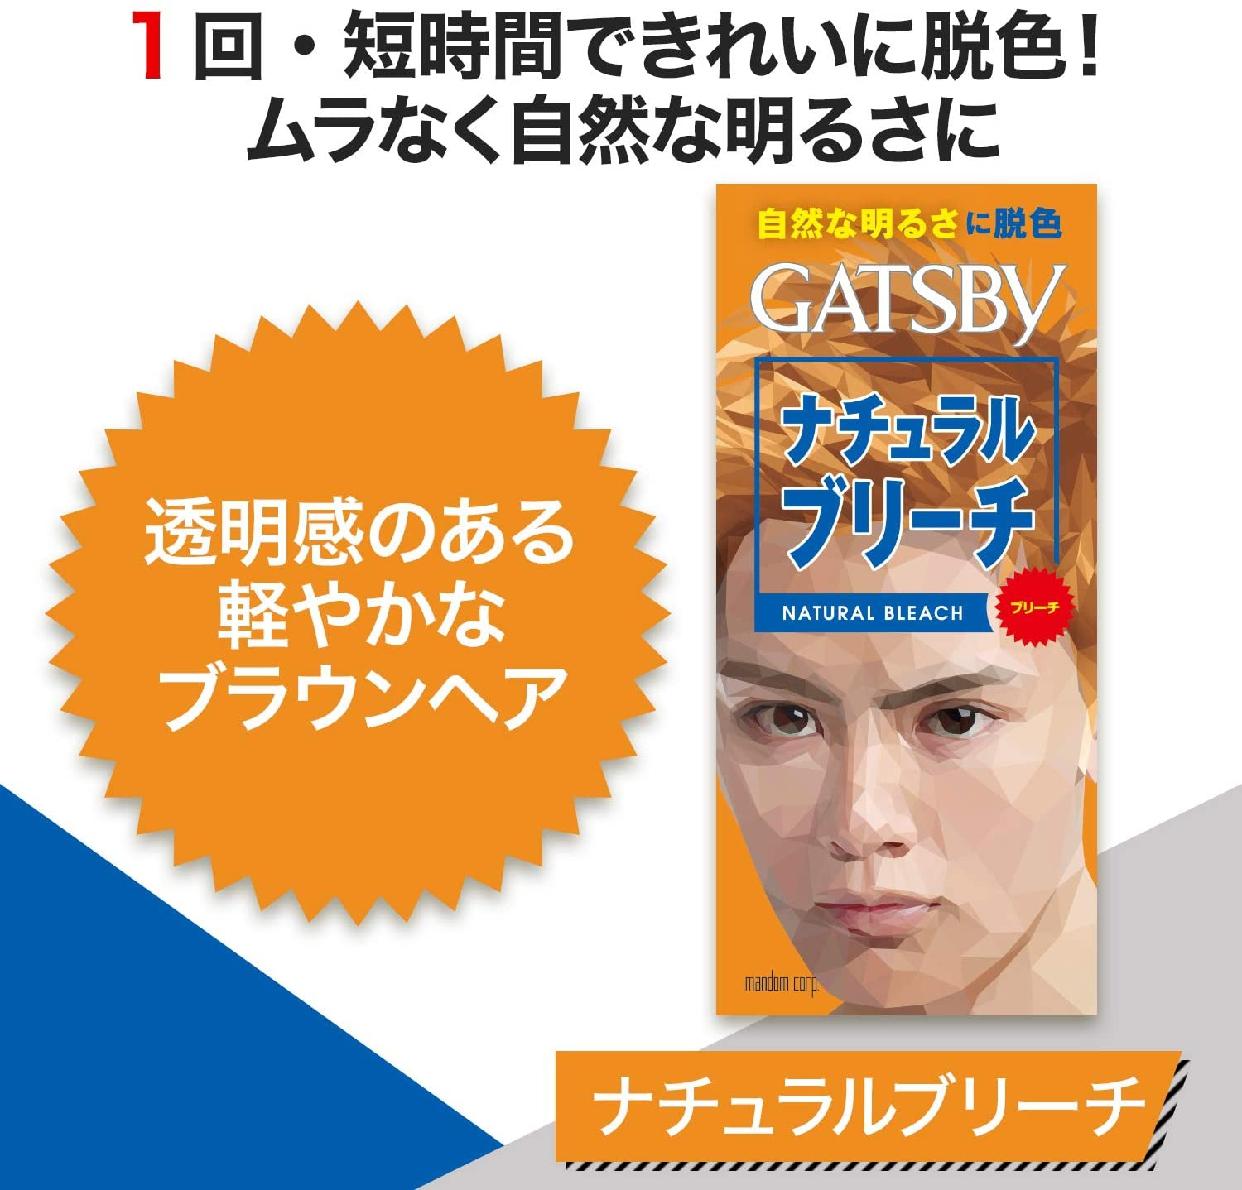 GATSBY(ギャツビー) ナチュラルブリーチの商品画像2